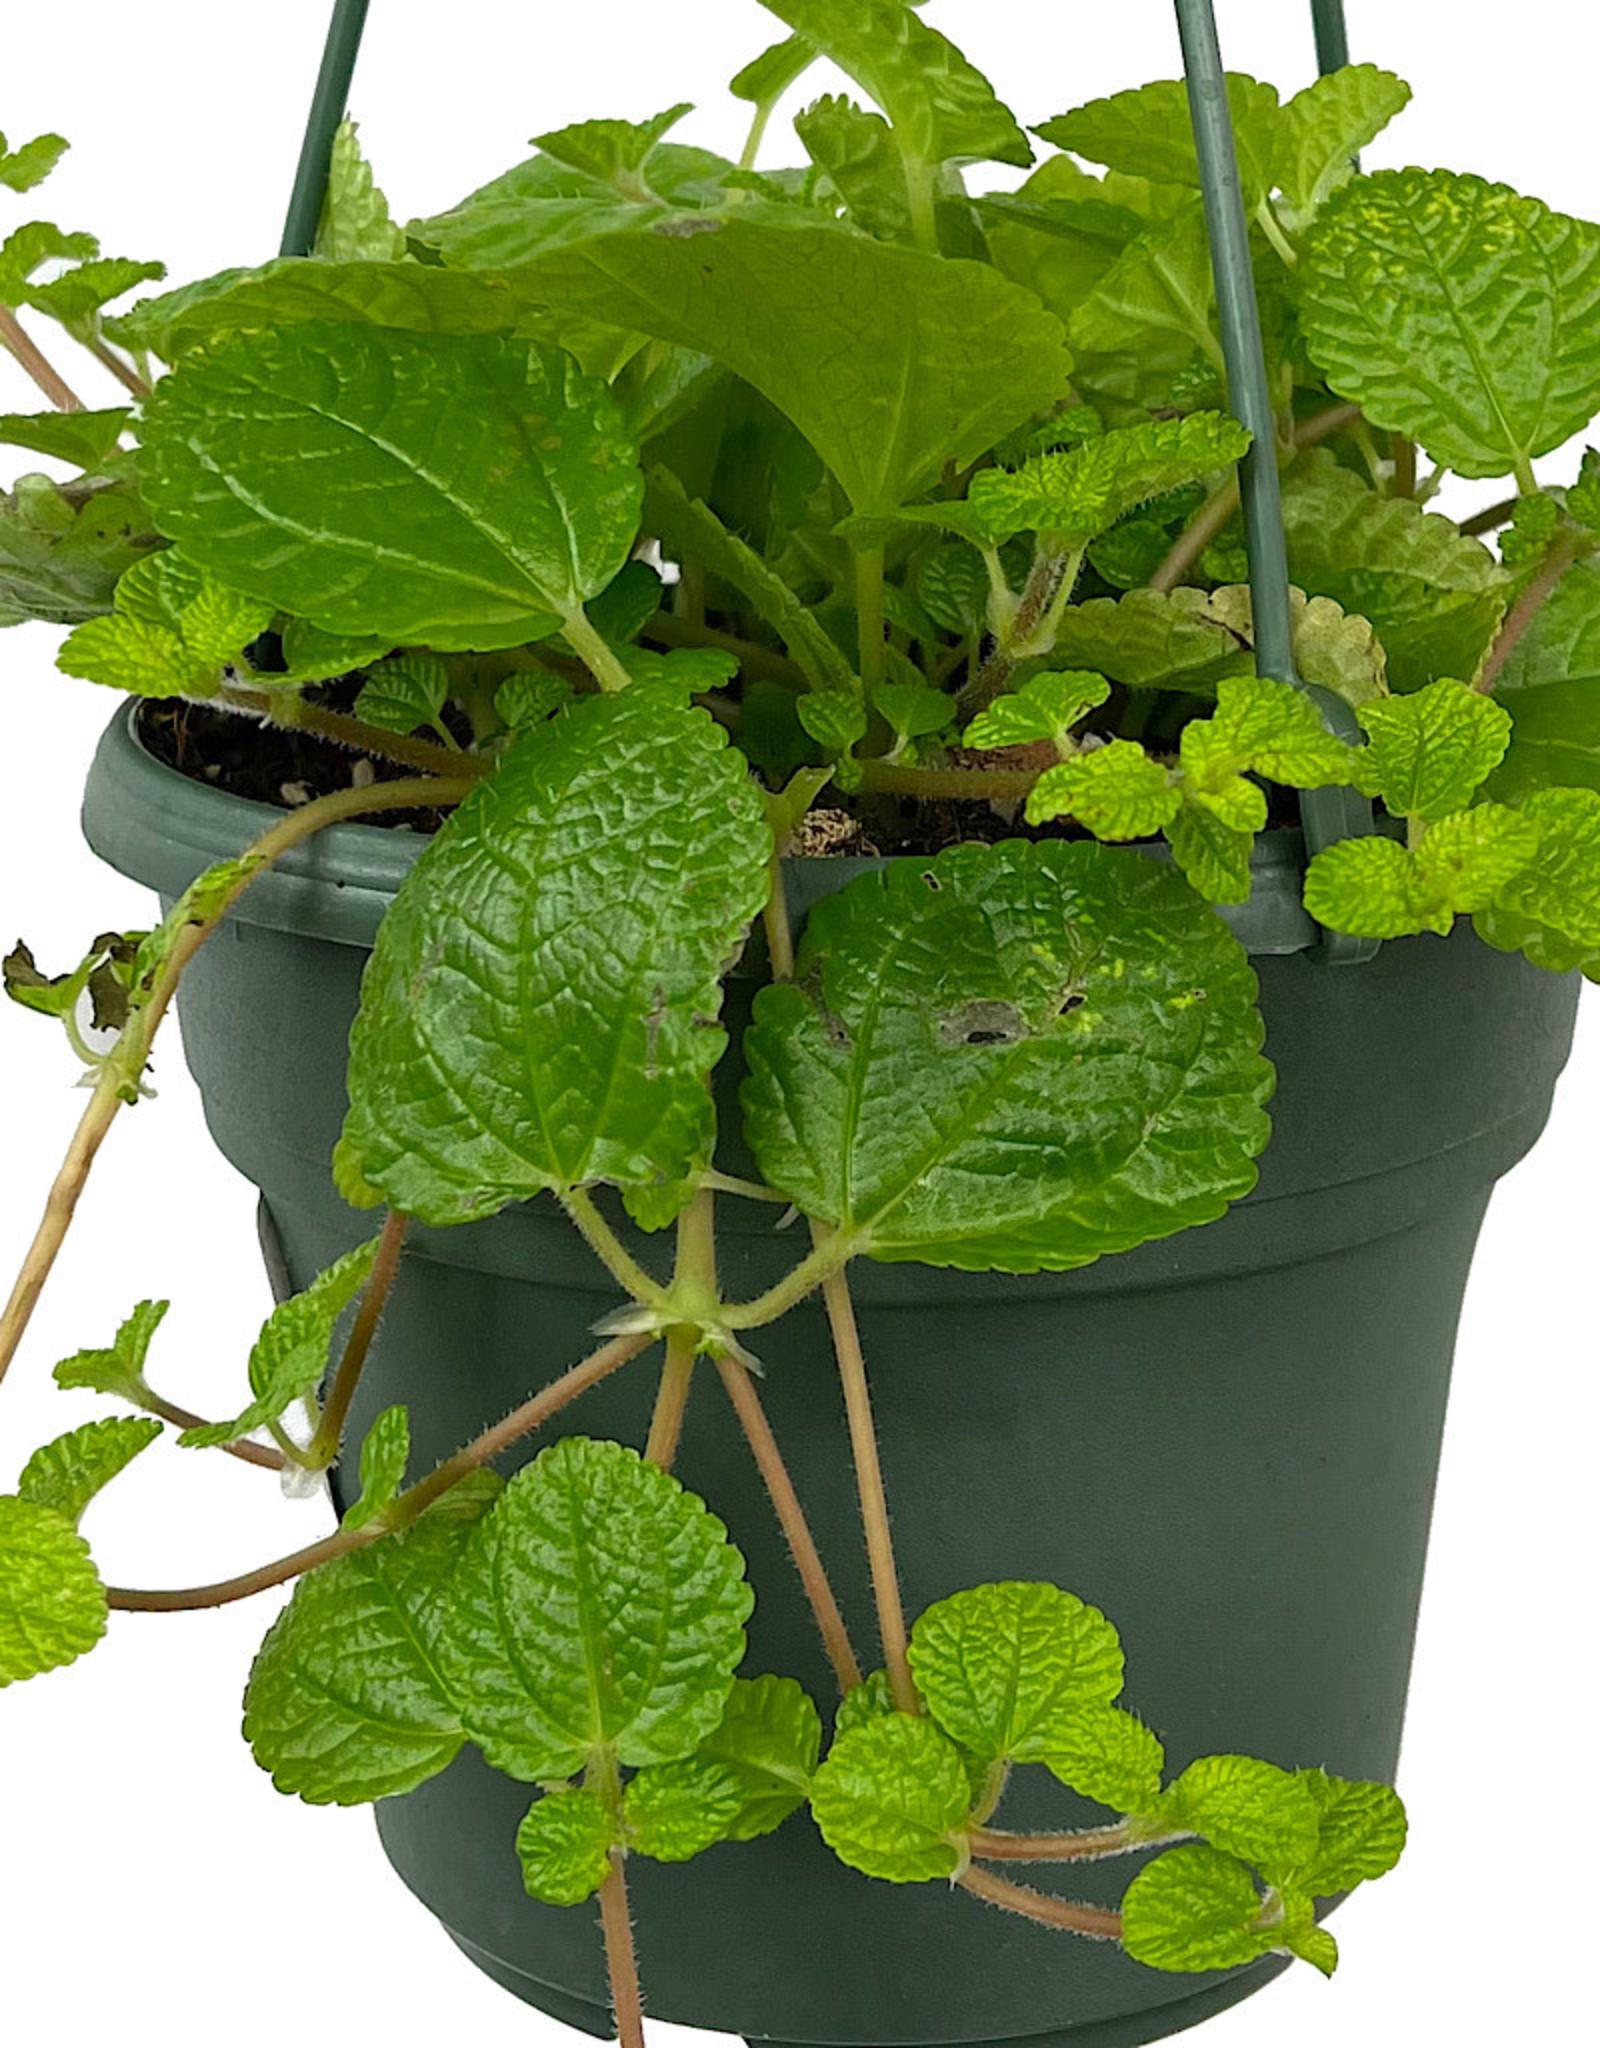 Pilea nummulariifolia 'Creeping Charlie' Hanging Basket 6 Inch